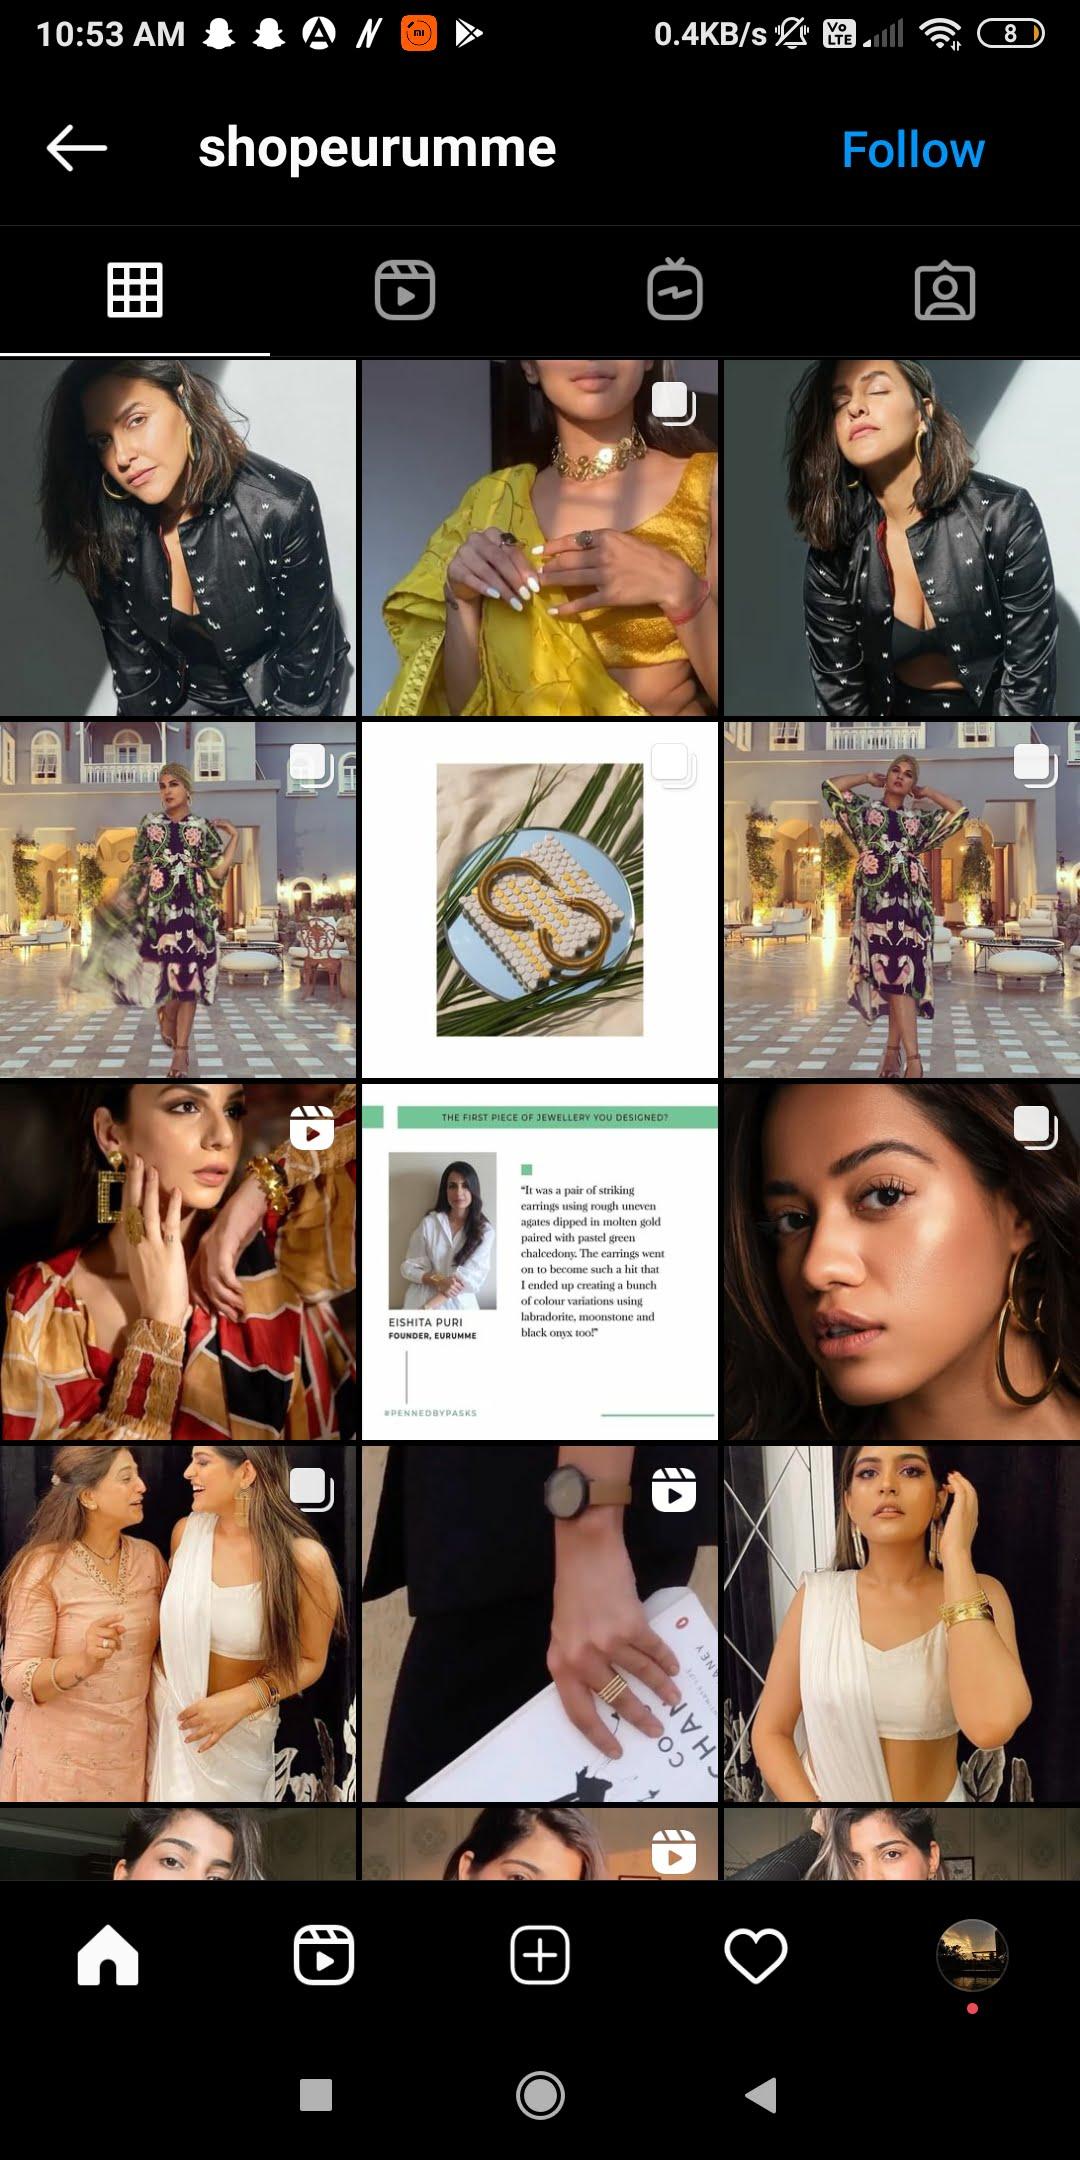 @shopeurumme  -  shopeurumme - 50+ SHOPPING Instagram ACCOUNTS for Clothes, Shoes, Jewellery 2021